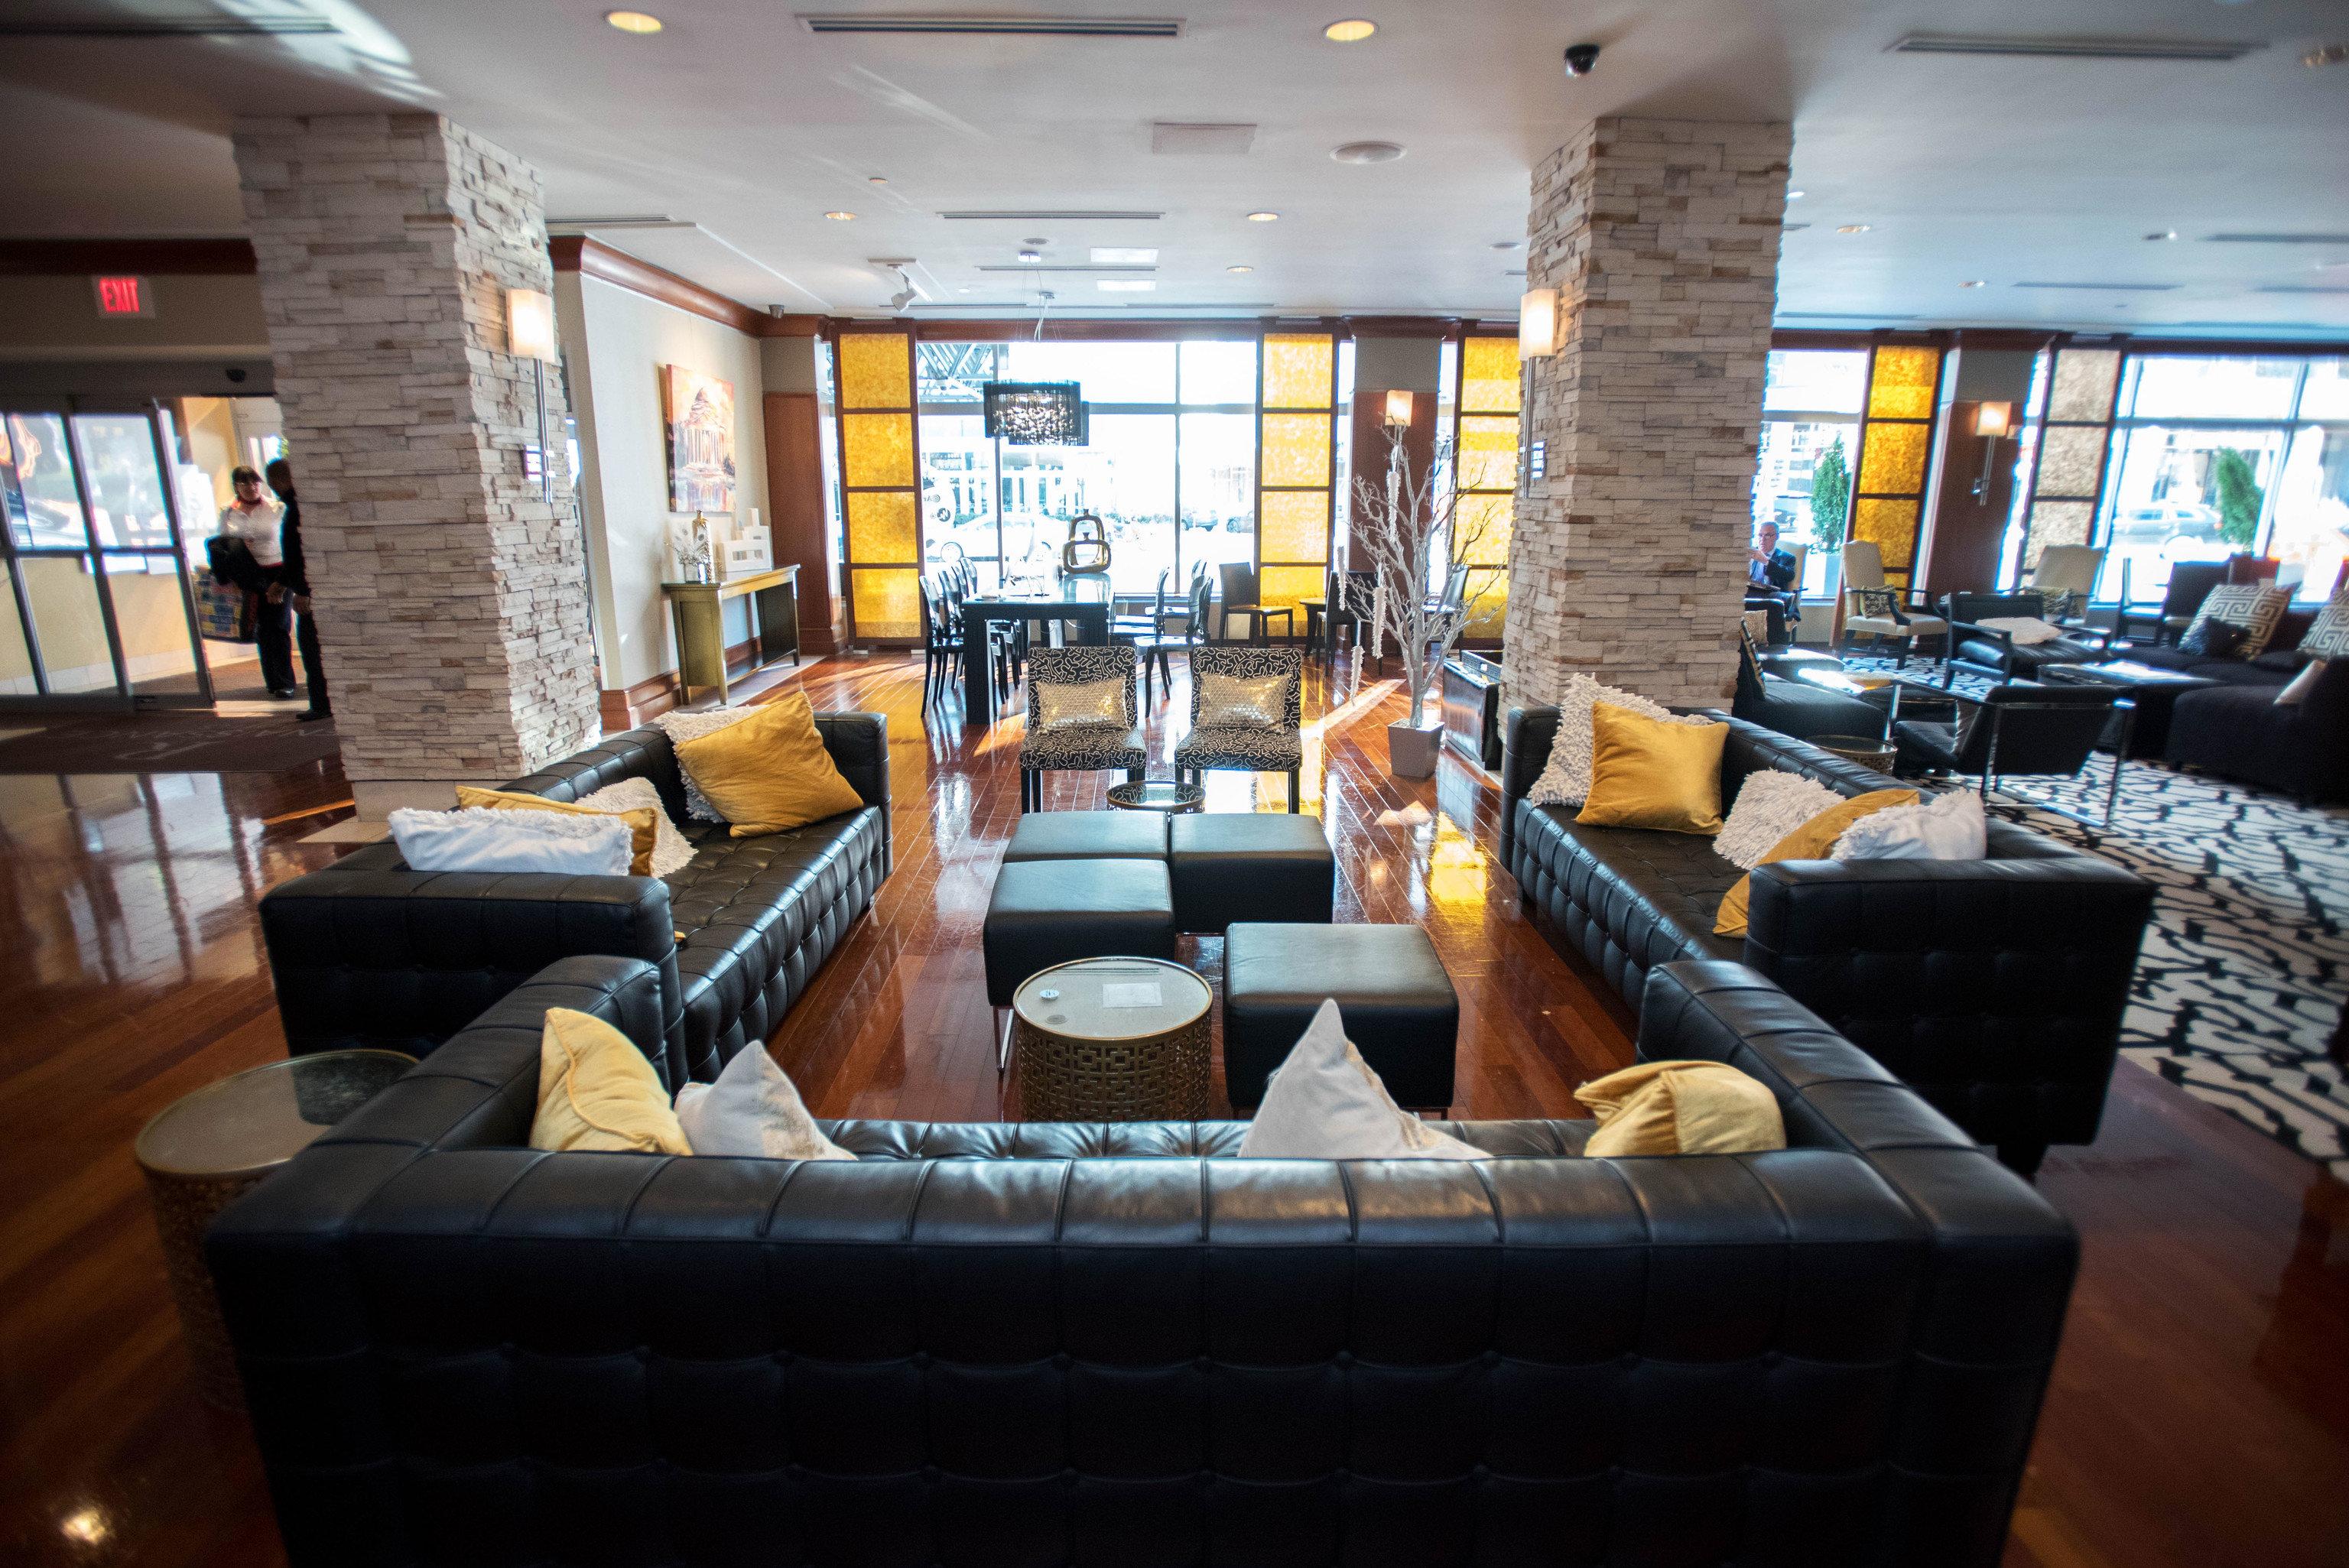 sofa property living room Lobby Resort home condominium vehicle restaurant Modern leather